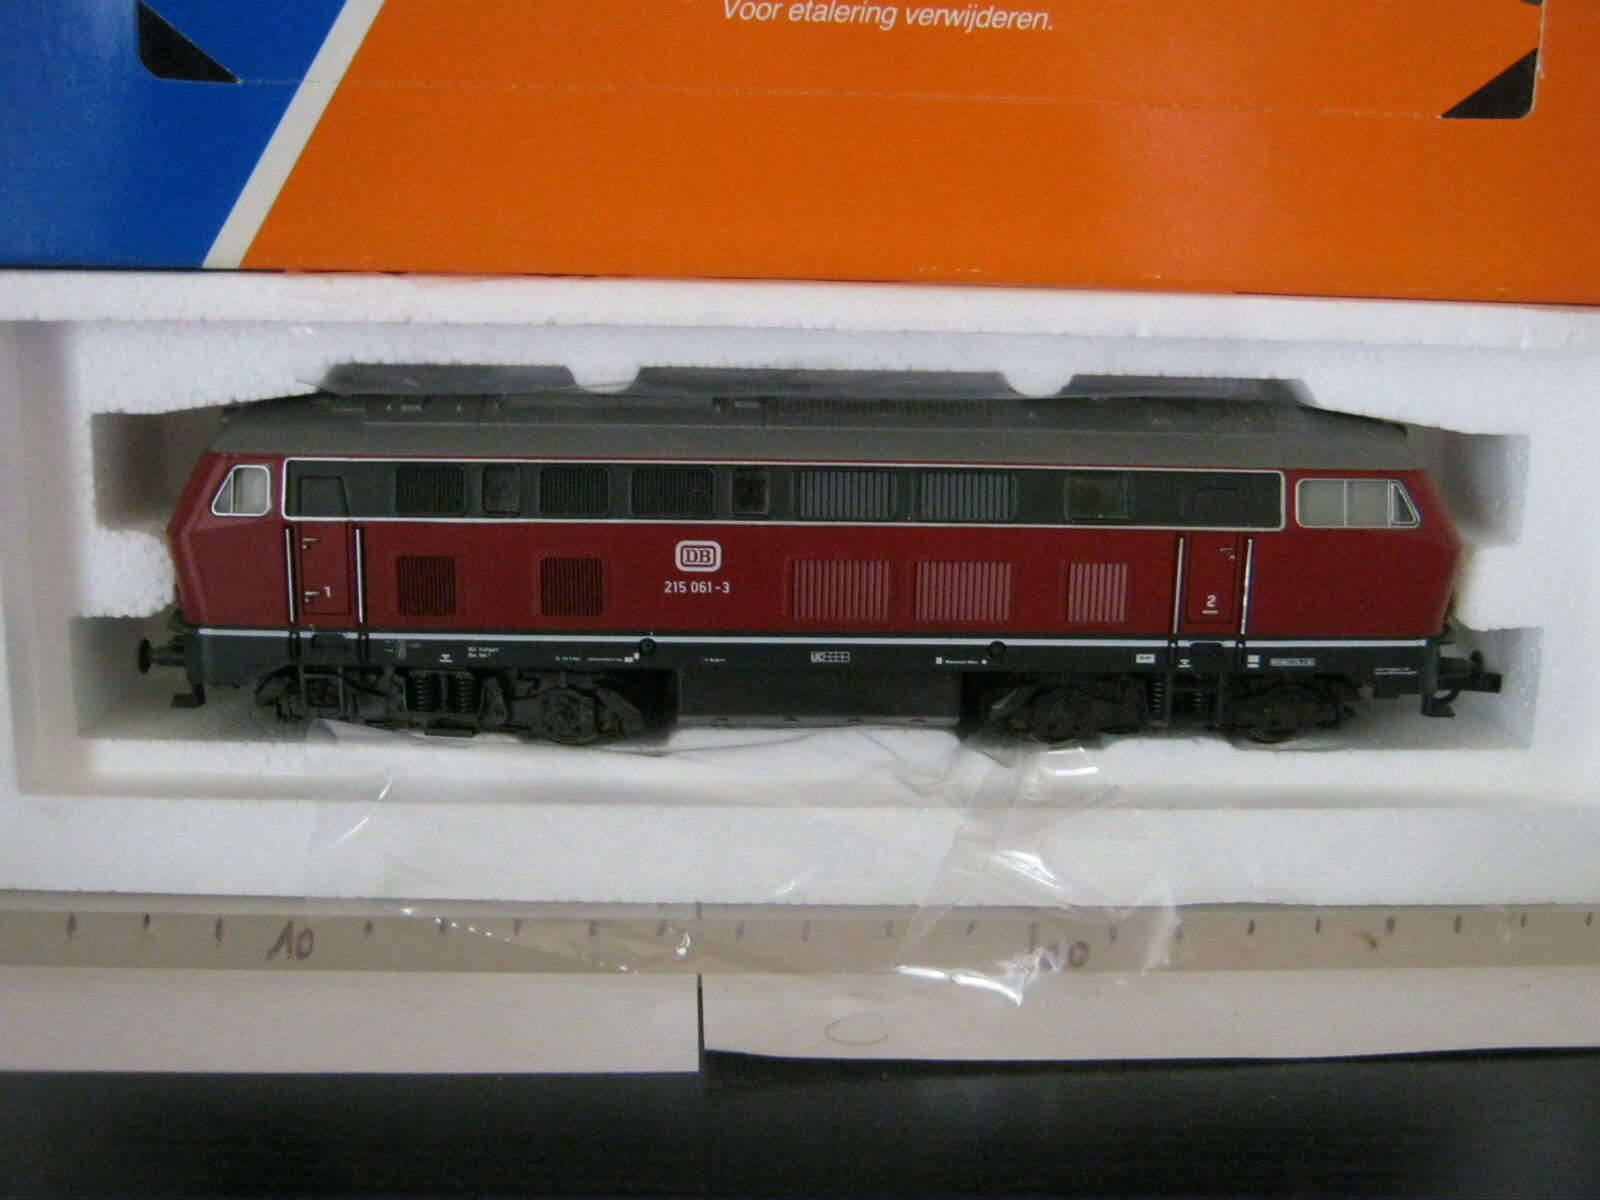 Roco HO 43417 Diesel Lok BtrNr 215 061-3 DB (RG BQ 145-51S7F2)